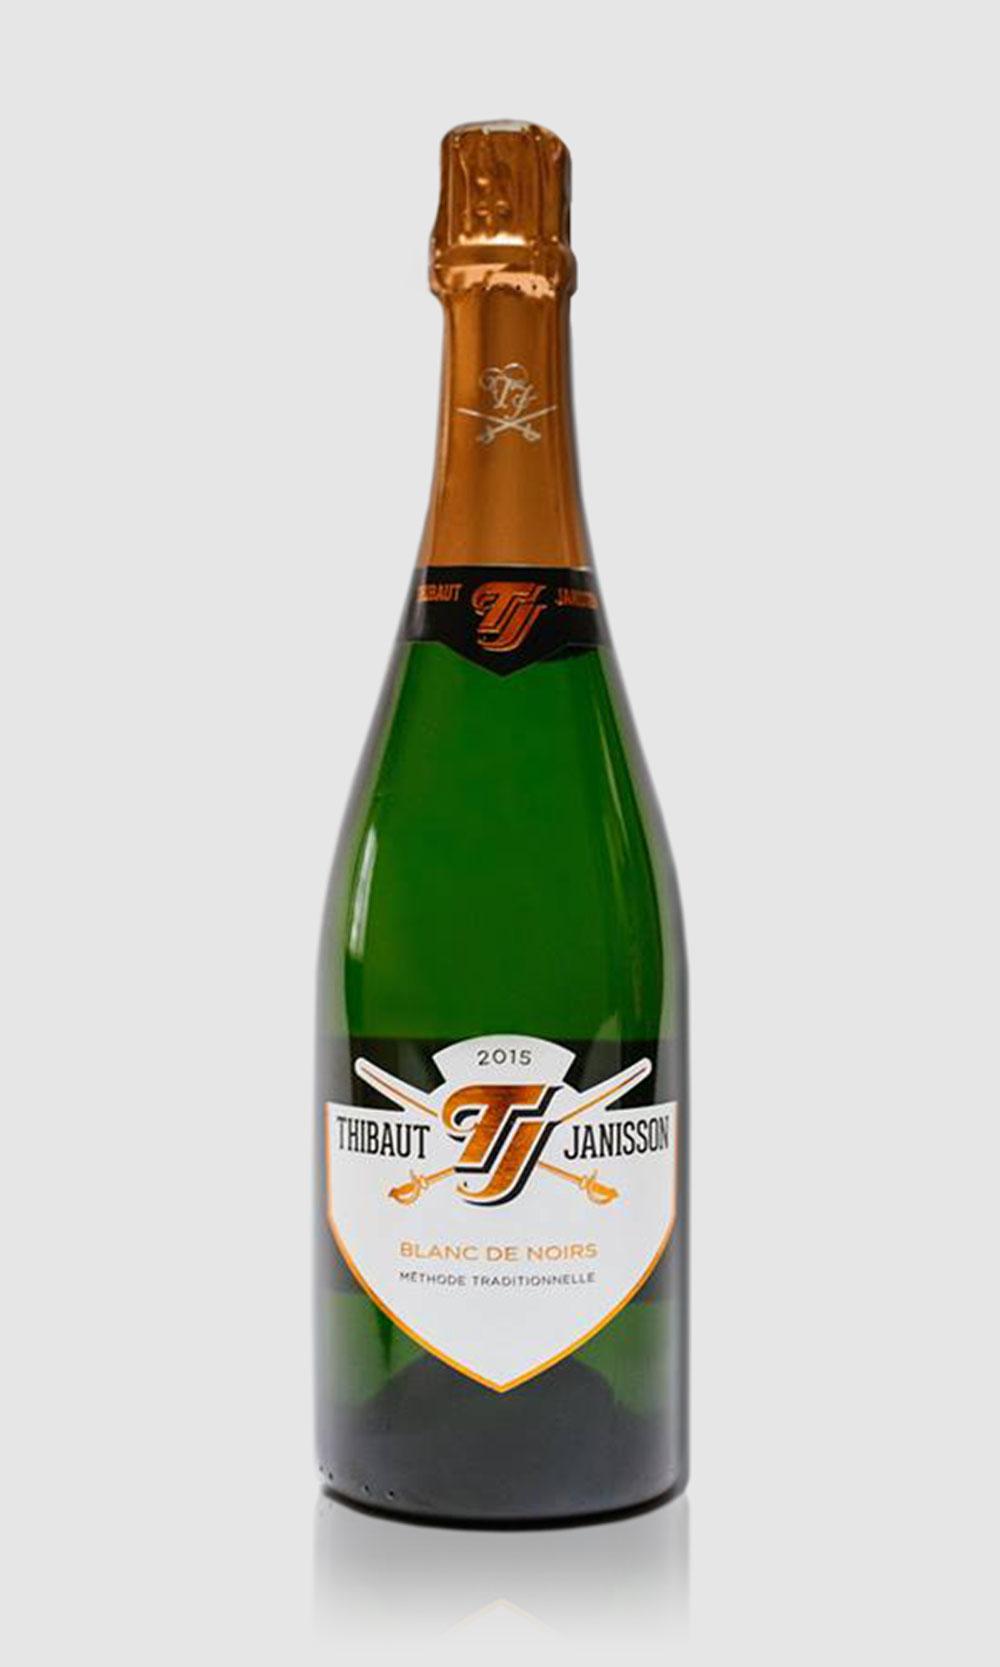 Thibaut Jannison Winery - Virginia Sparkling Wine - Blanc de Noirs